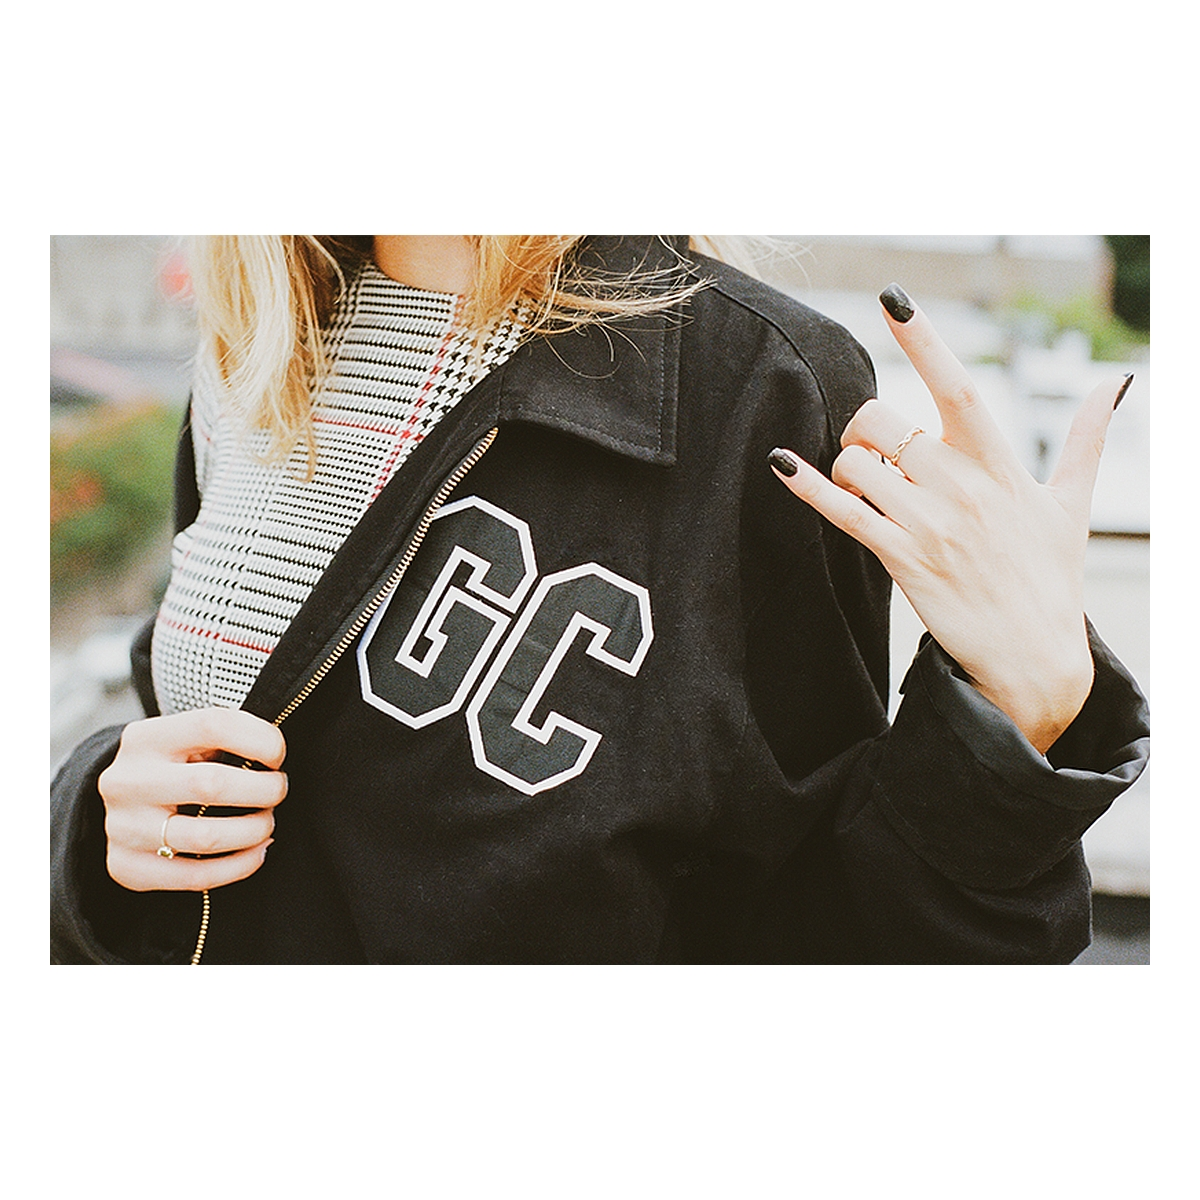 The Global Swagizen Jacket